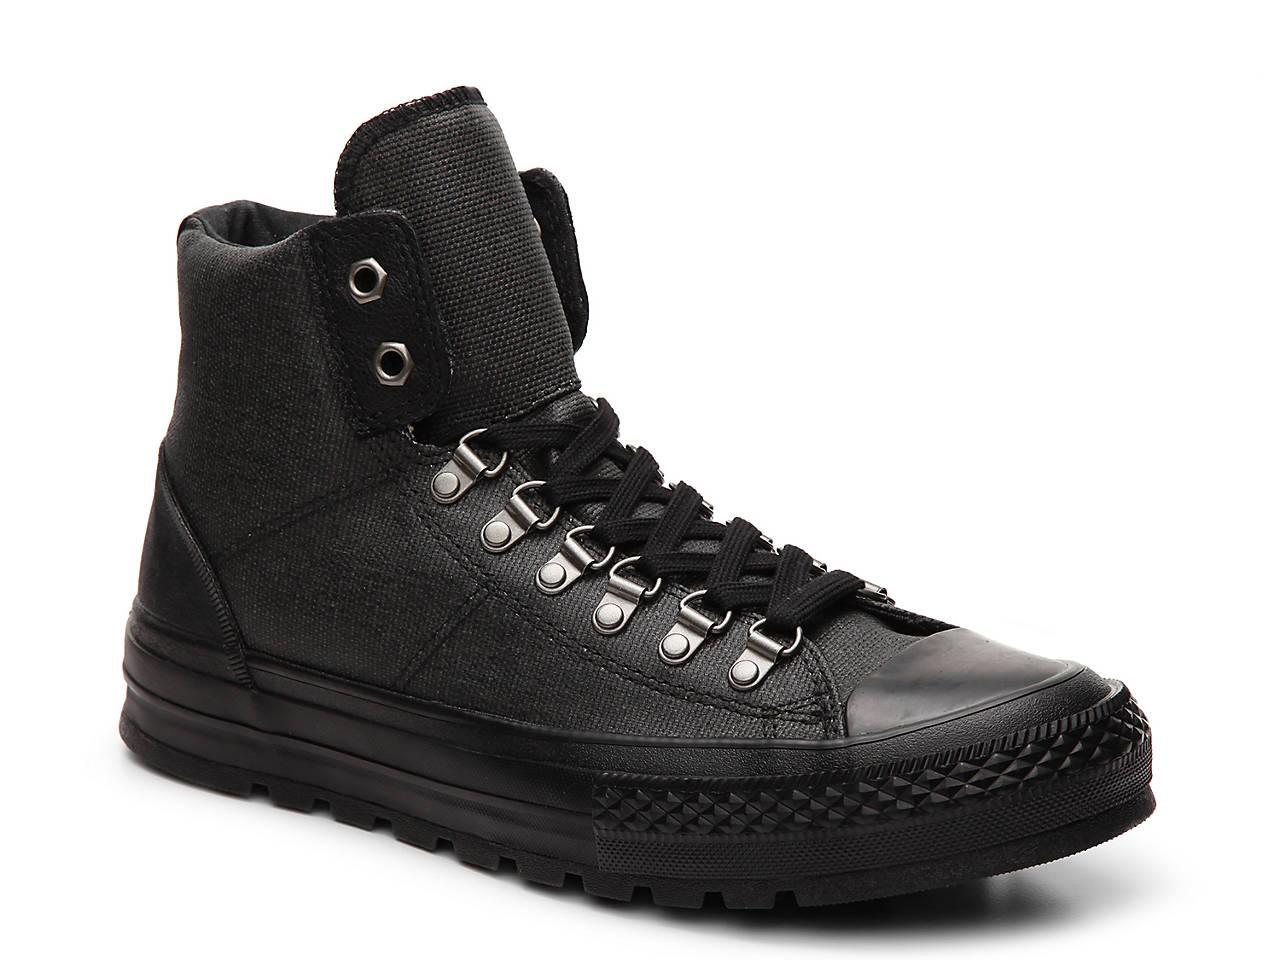 All Converse Hiker Chaussures Chuck Taylor Converse Hi Street Star Bx7tqOrawx